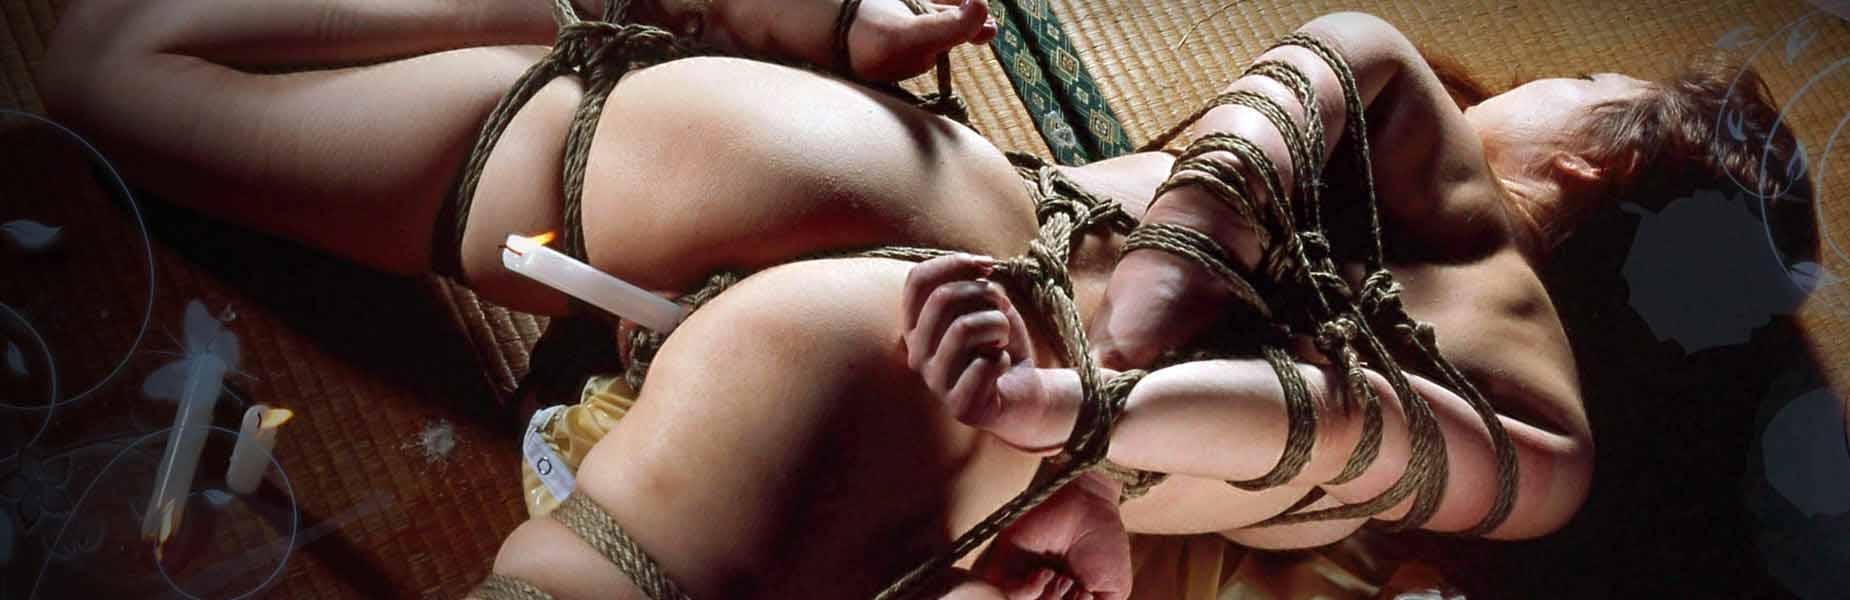 sex-free-asian-gaggin-bondage-movies-trivia-dick-white